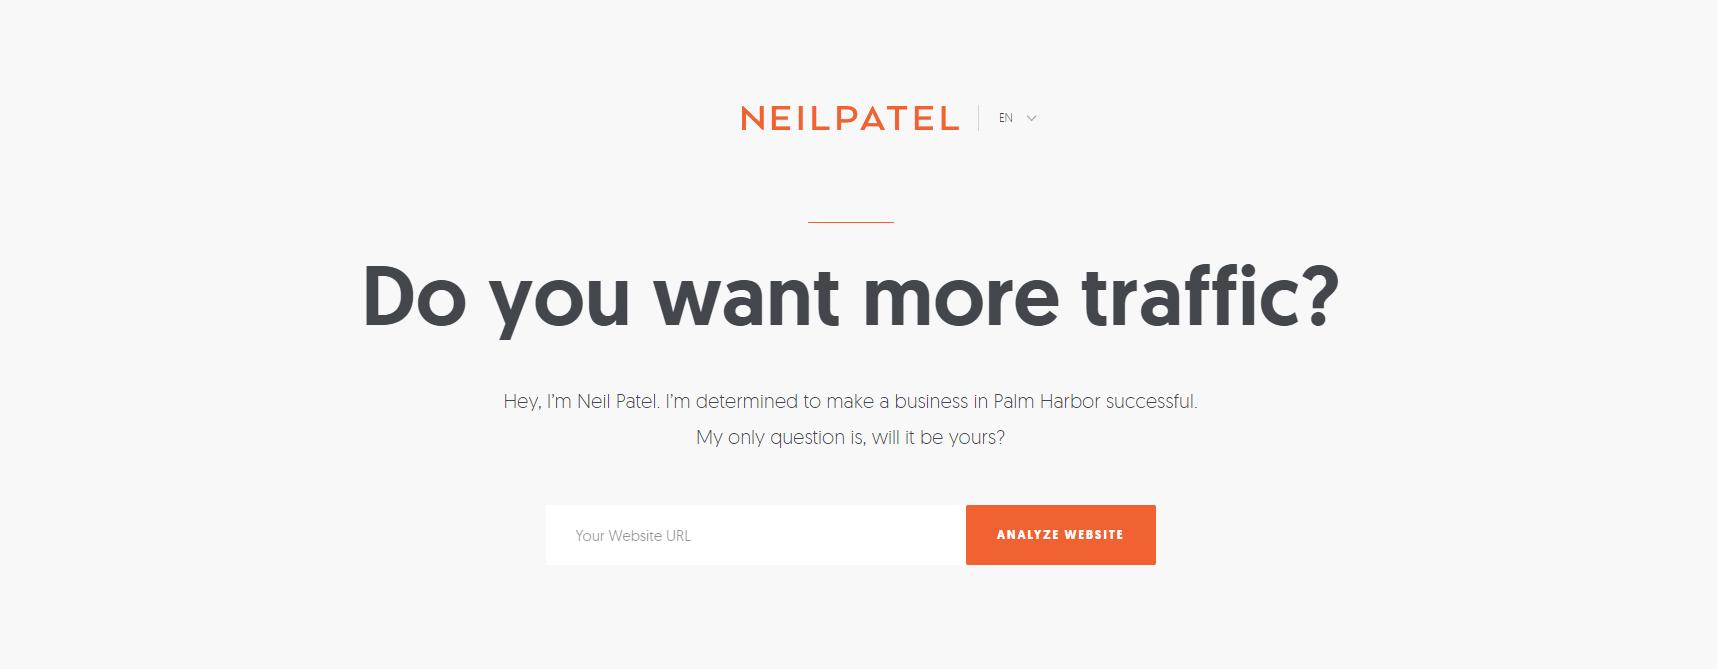 Neilpatel Homepage